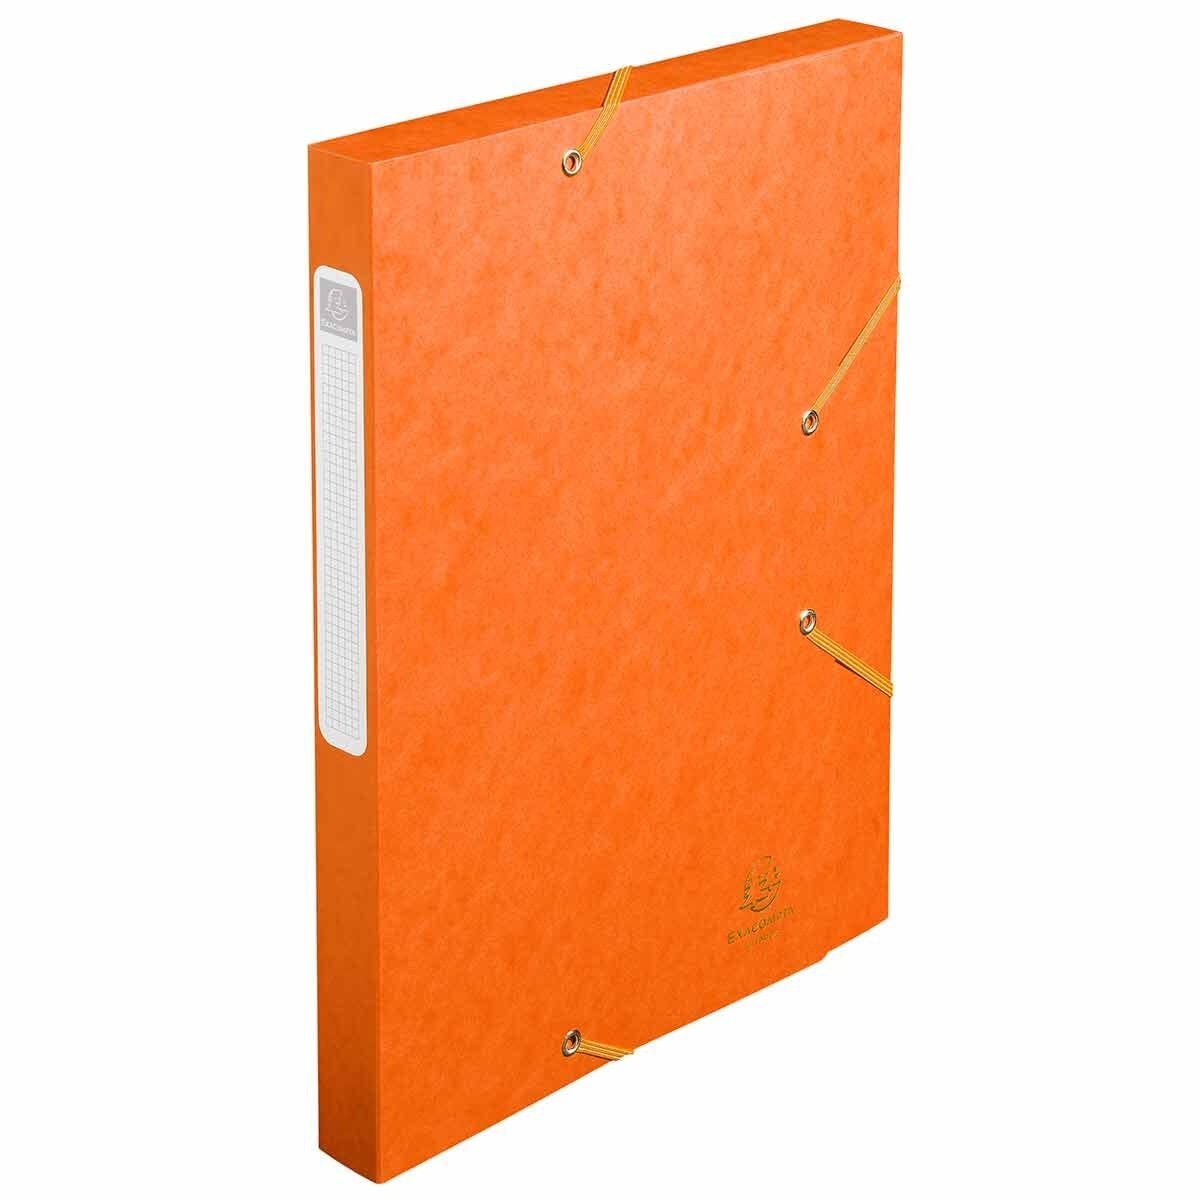 Exacompta Cartobox Box File 25mm 400g A4 Pack of 25 Orange